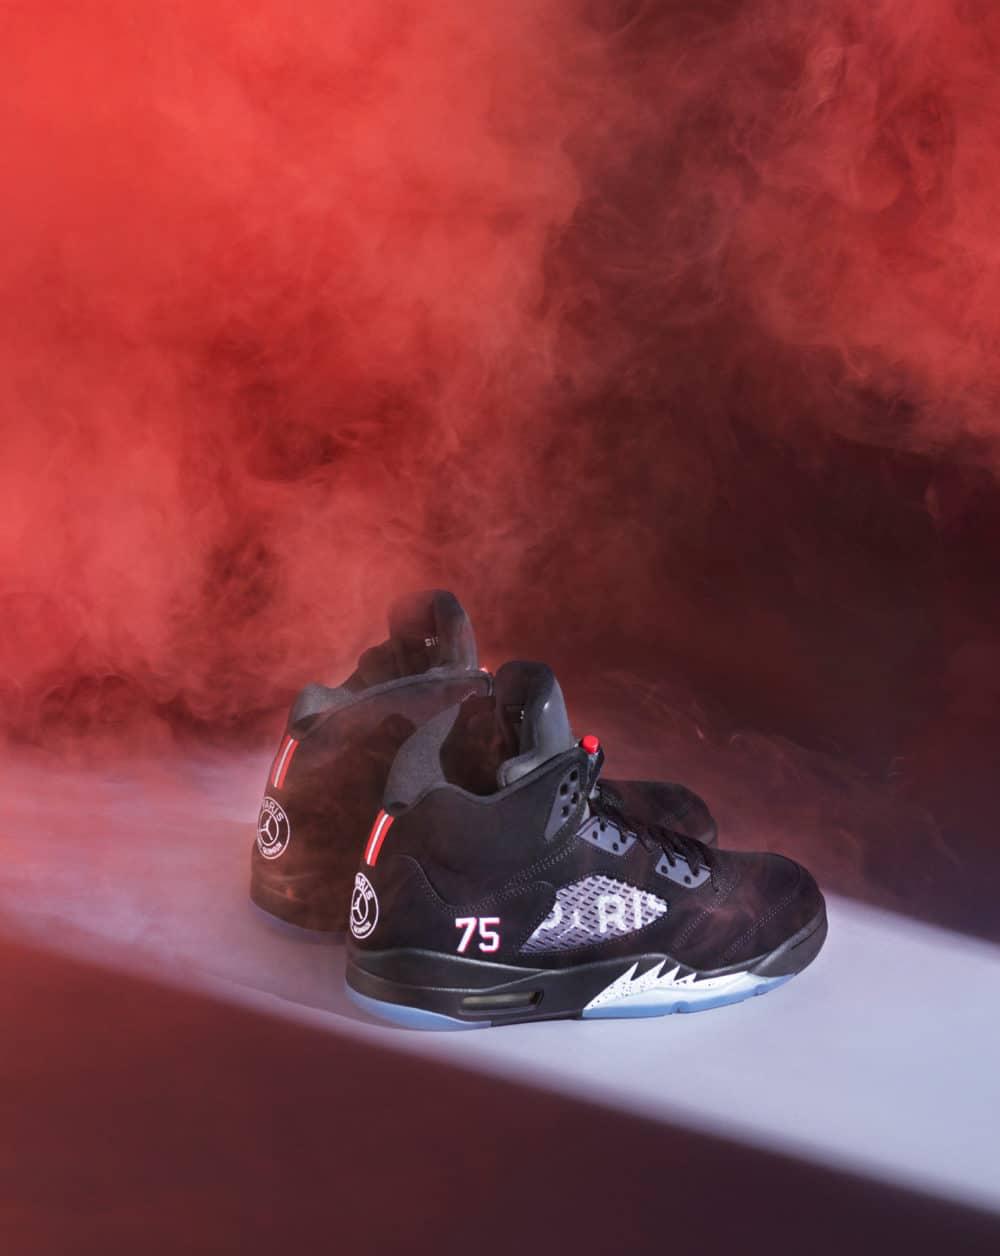 945d8fe44995 Jordan Brand x PSG - Nike Air Jordan V